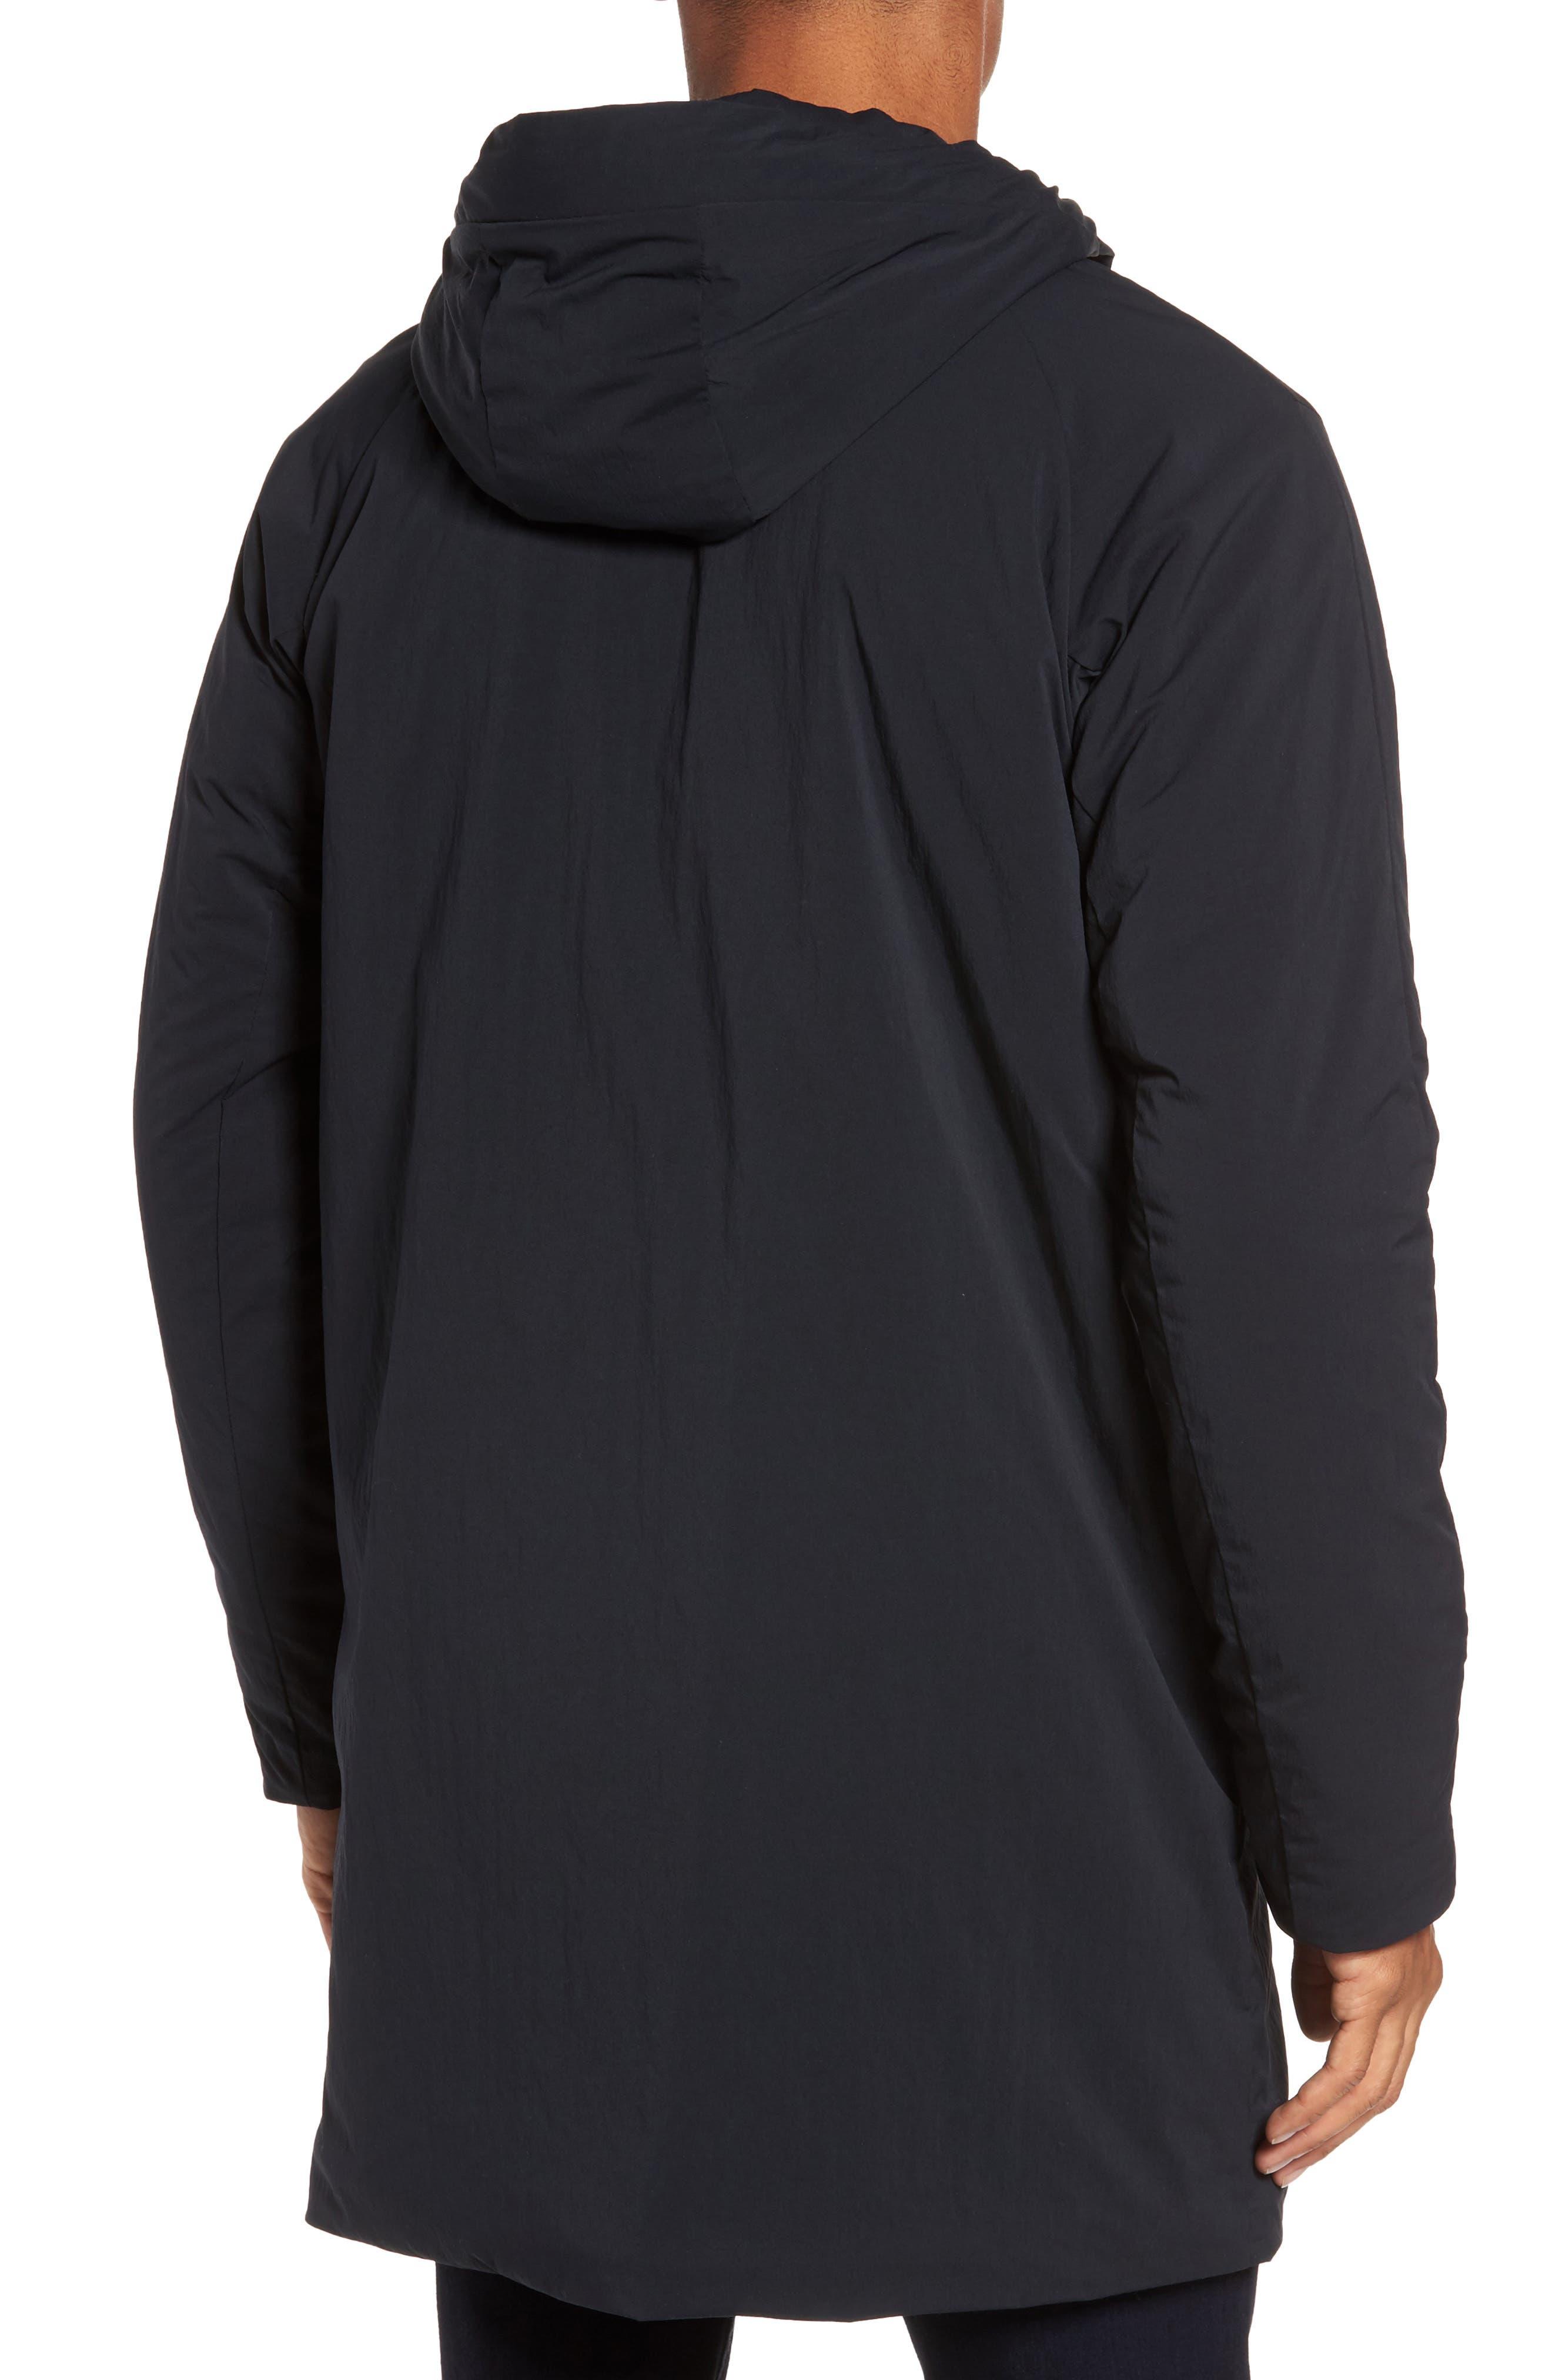 Insulated Trim Sideline Jacket,                             Alternate thumbnail 2, color,                             Black